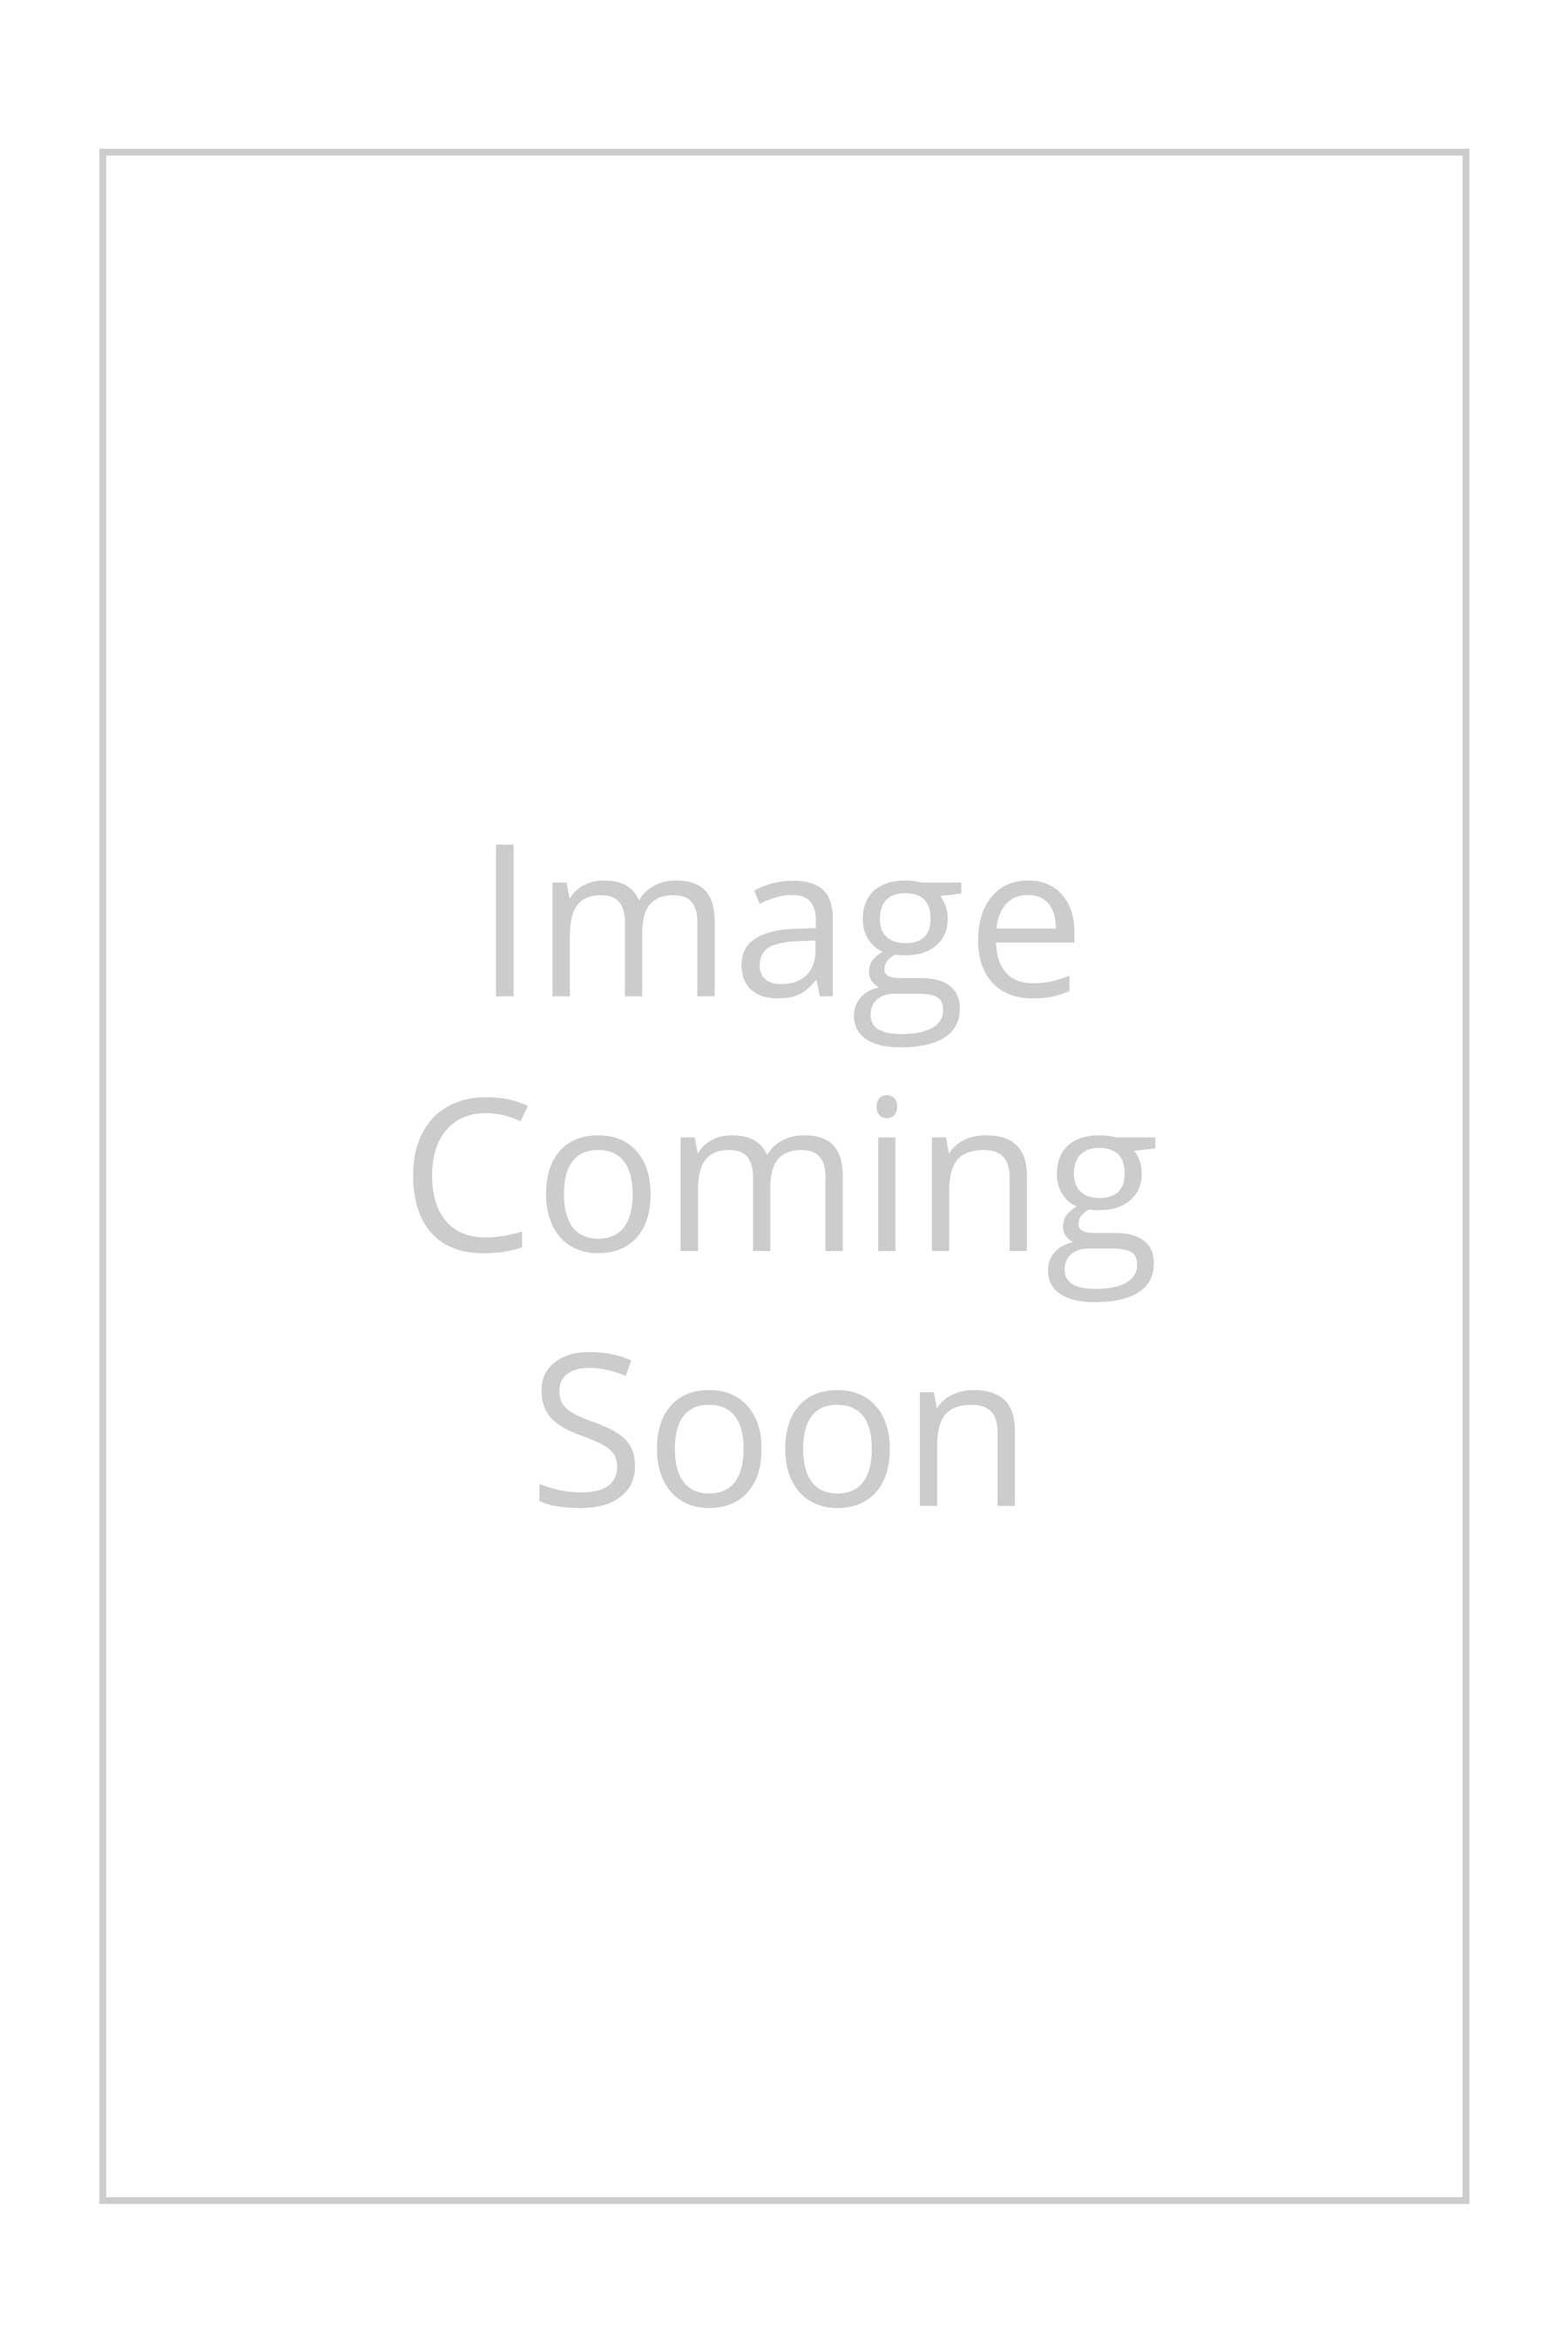 St John Sleeveless V-Neck Santana Knit Top in Black